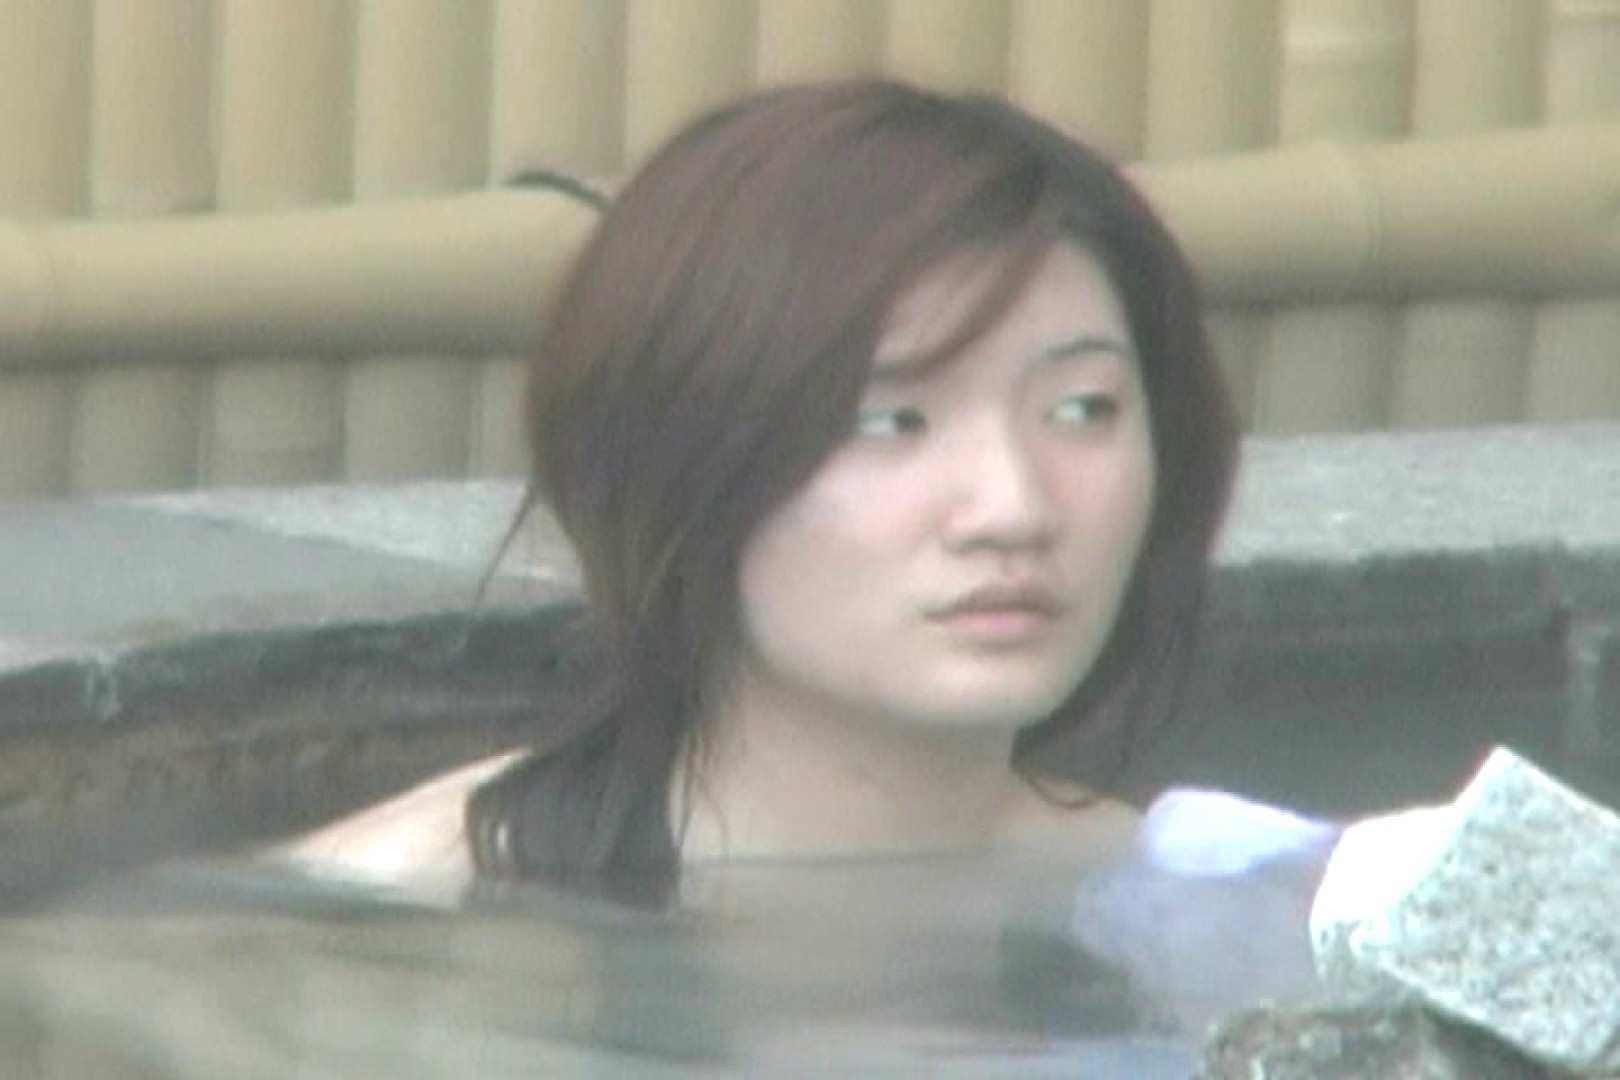 Aquaな露天風呂Vol.590 HなOL 濡れ場動画紹介 112pic 77